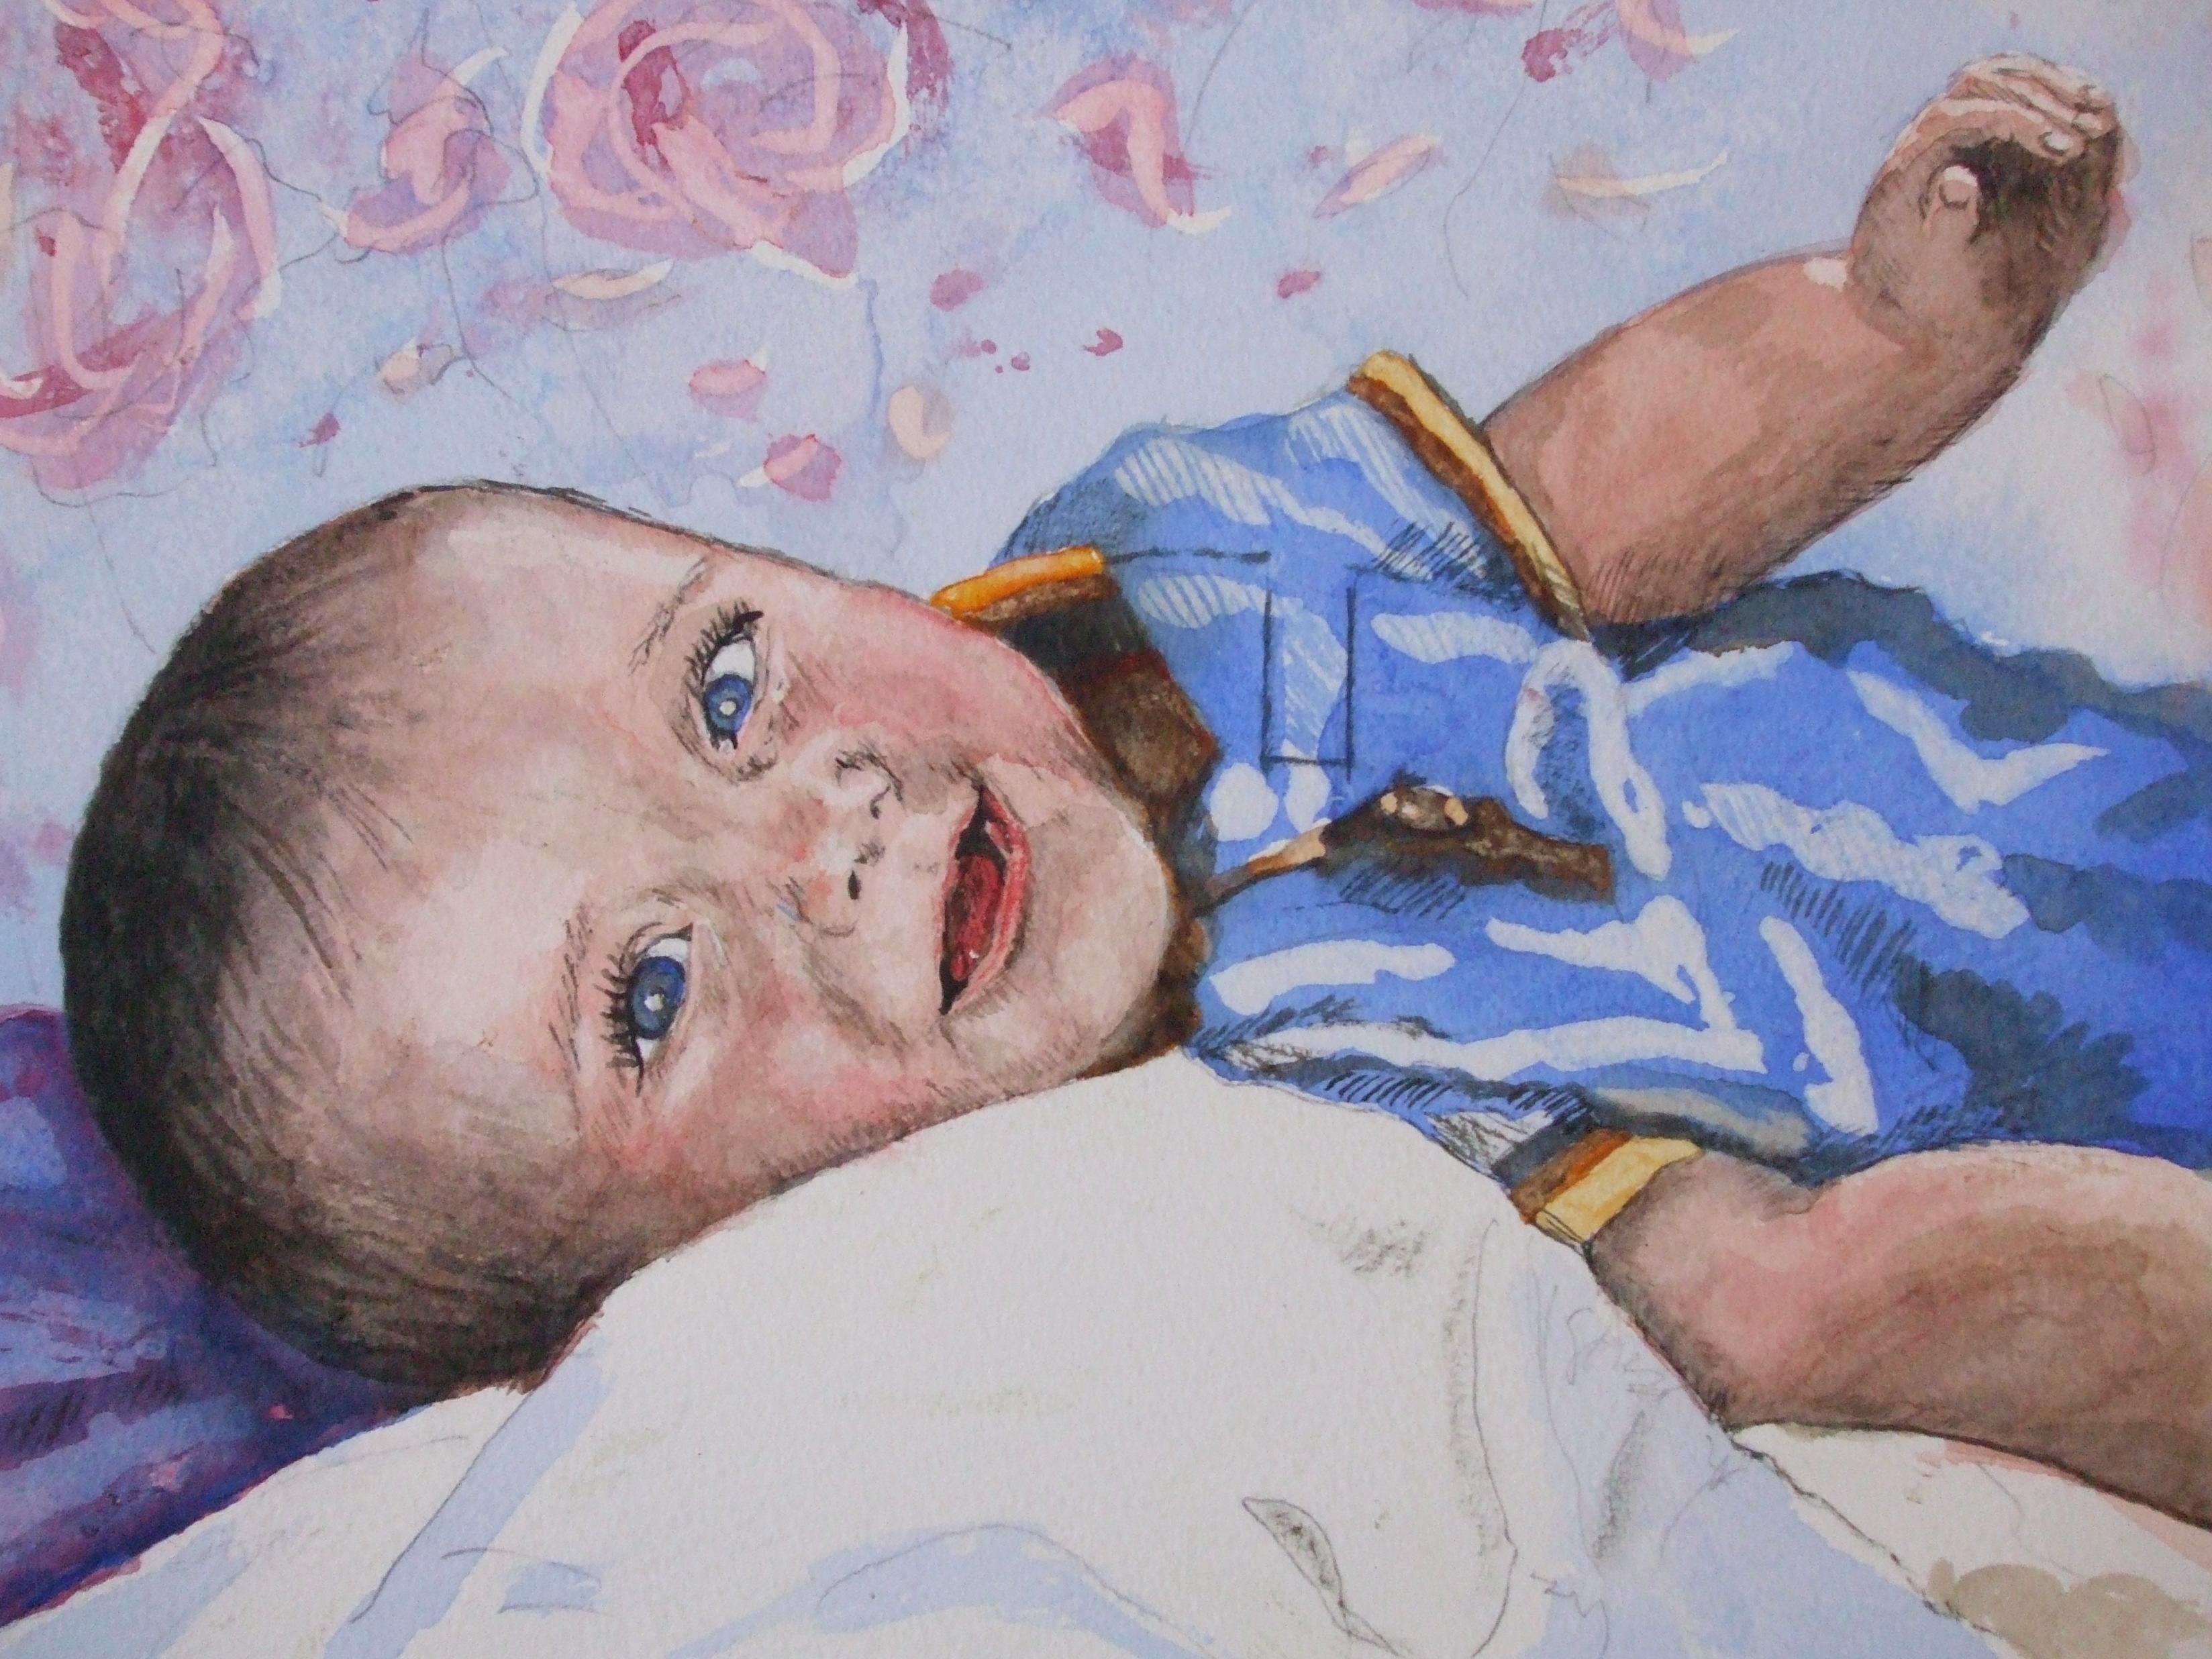 baby-portrait-painting-karenjanegreen.artist